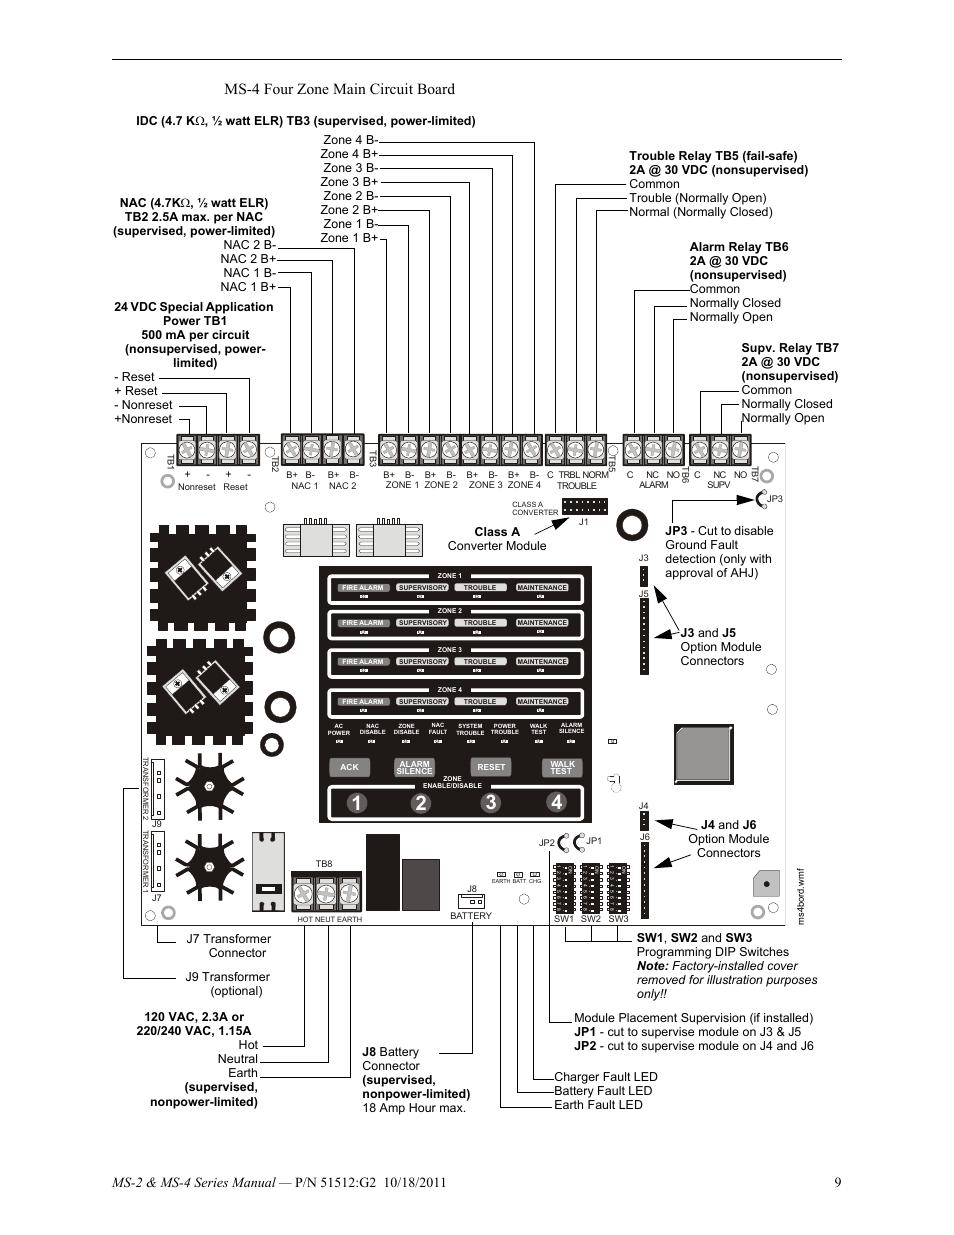 Pool Alarm Wiring Diagram Honda Ignition Wiring Diagram